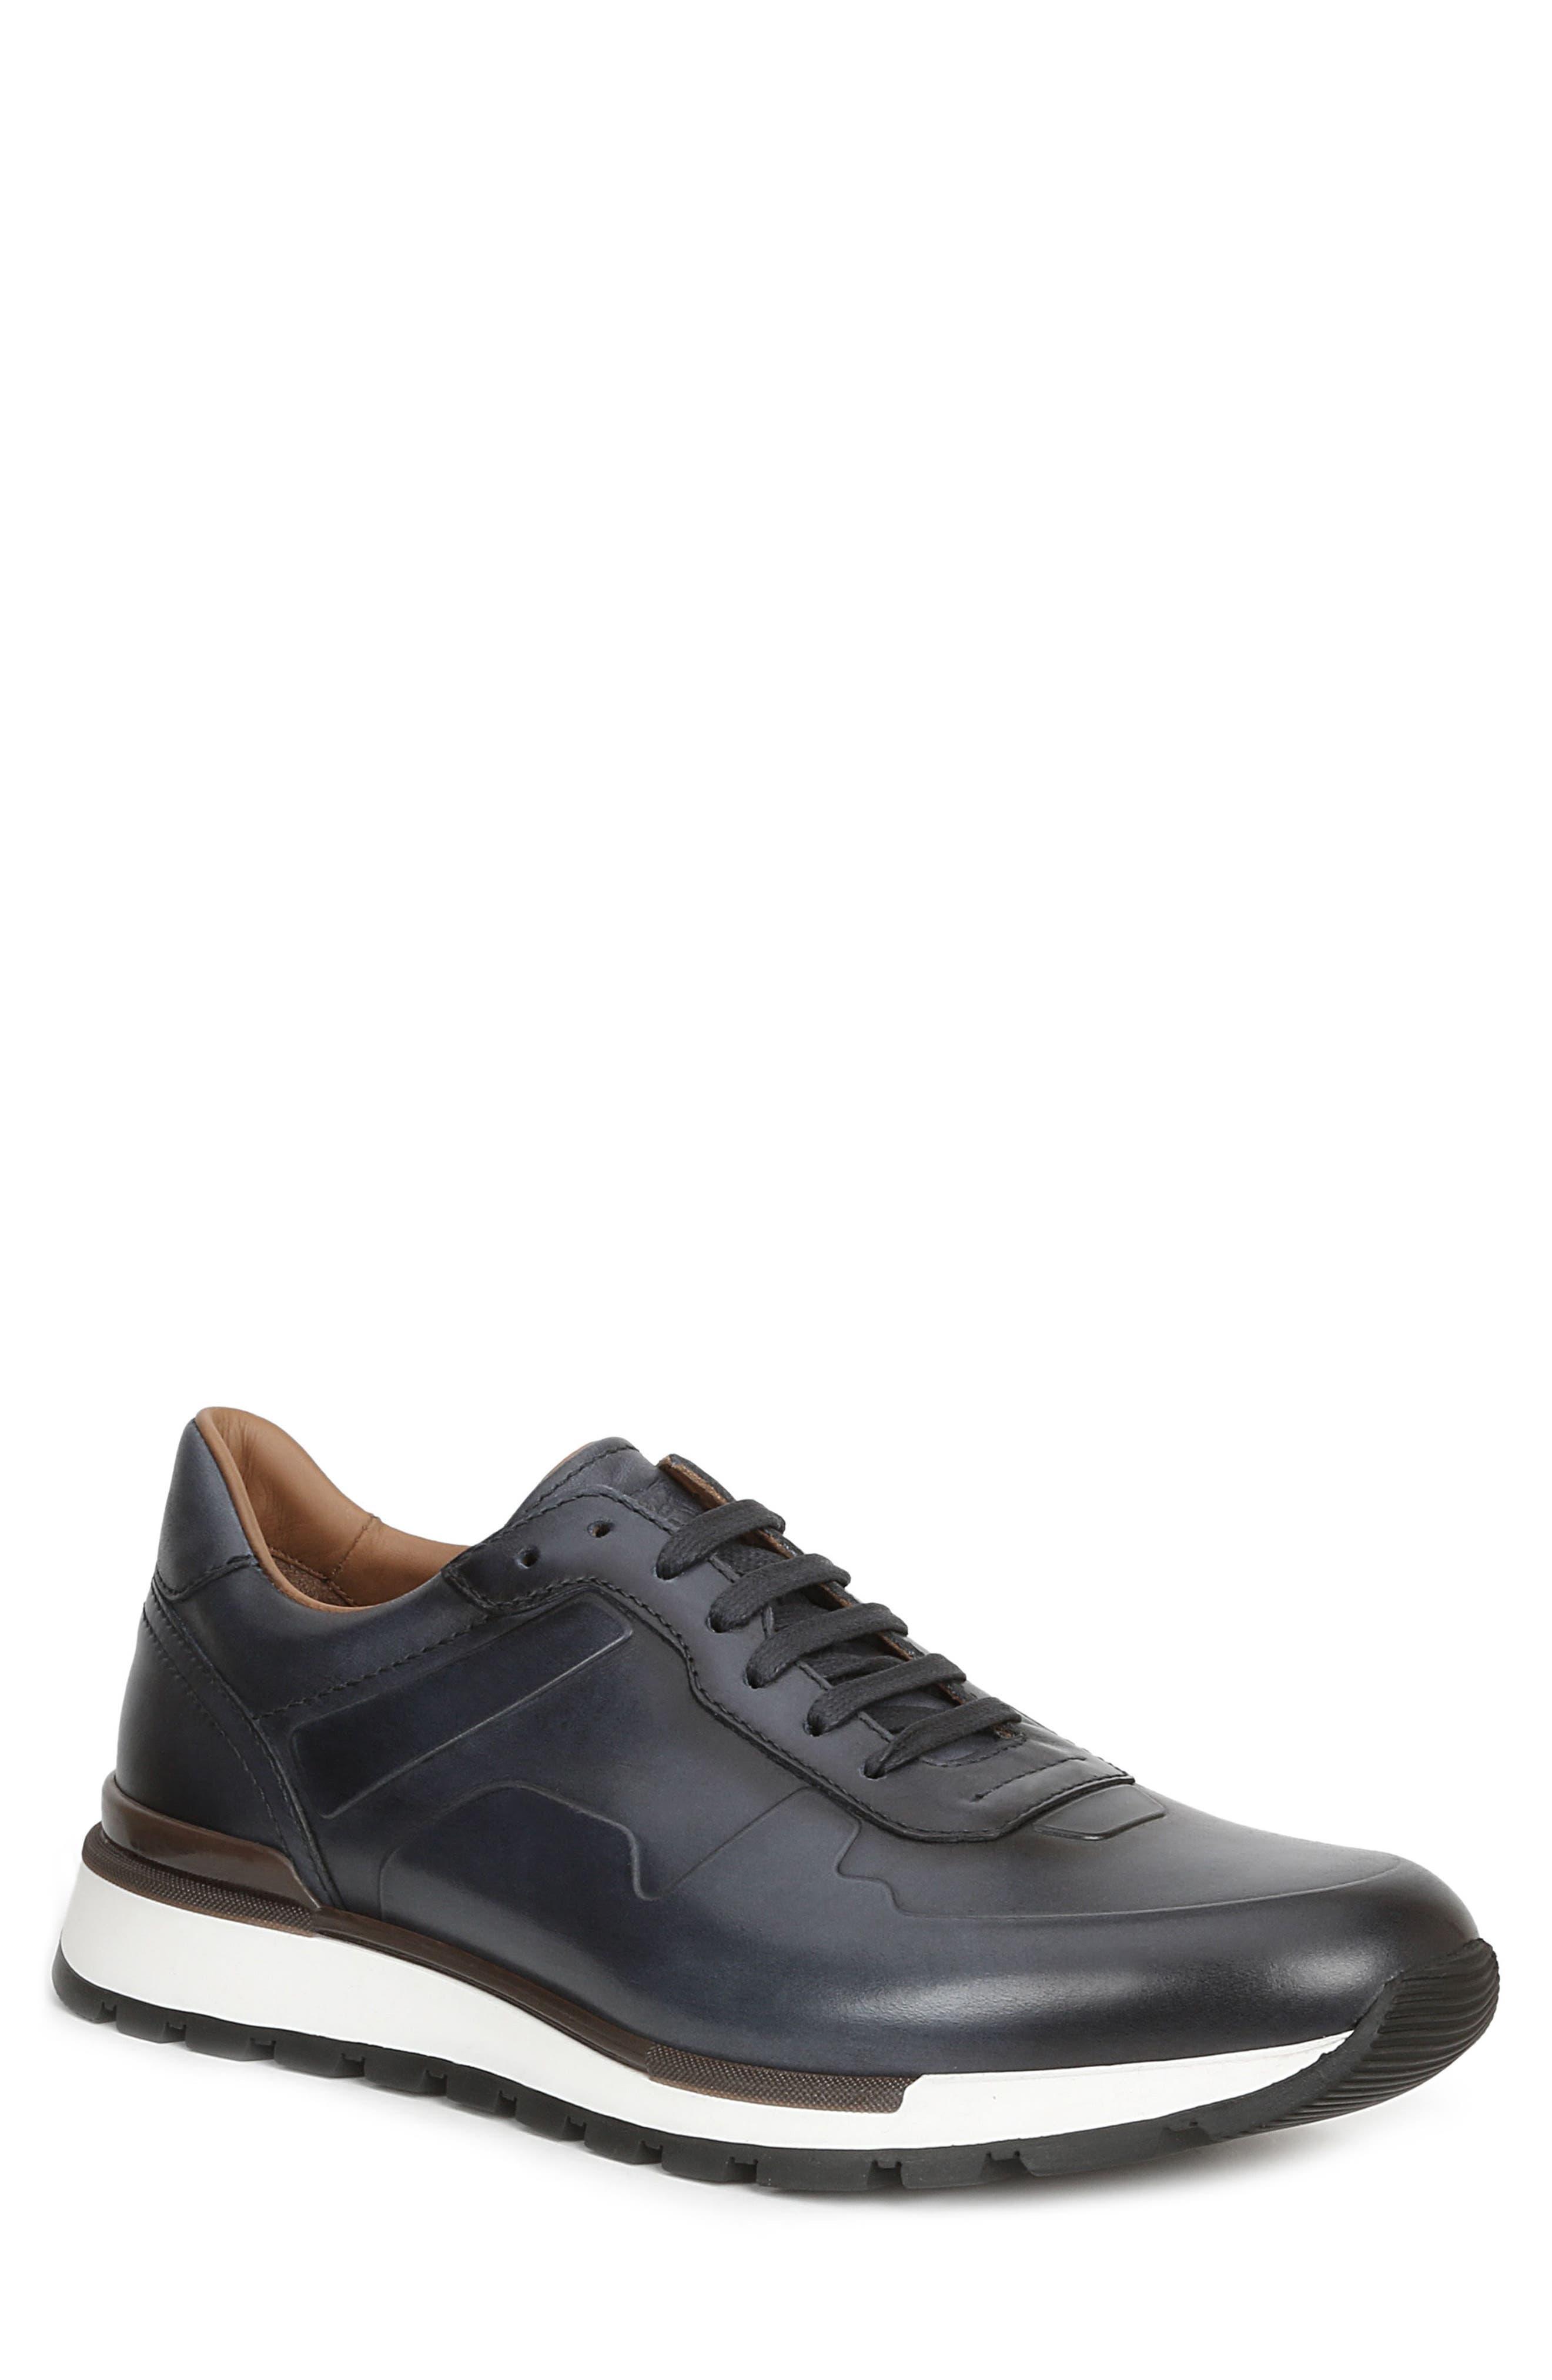 BRUNO MAGLI Davio Polished Leather Sneakers in Navy